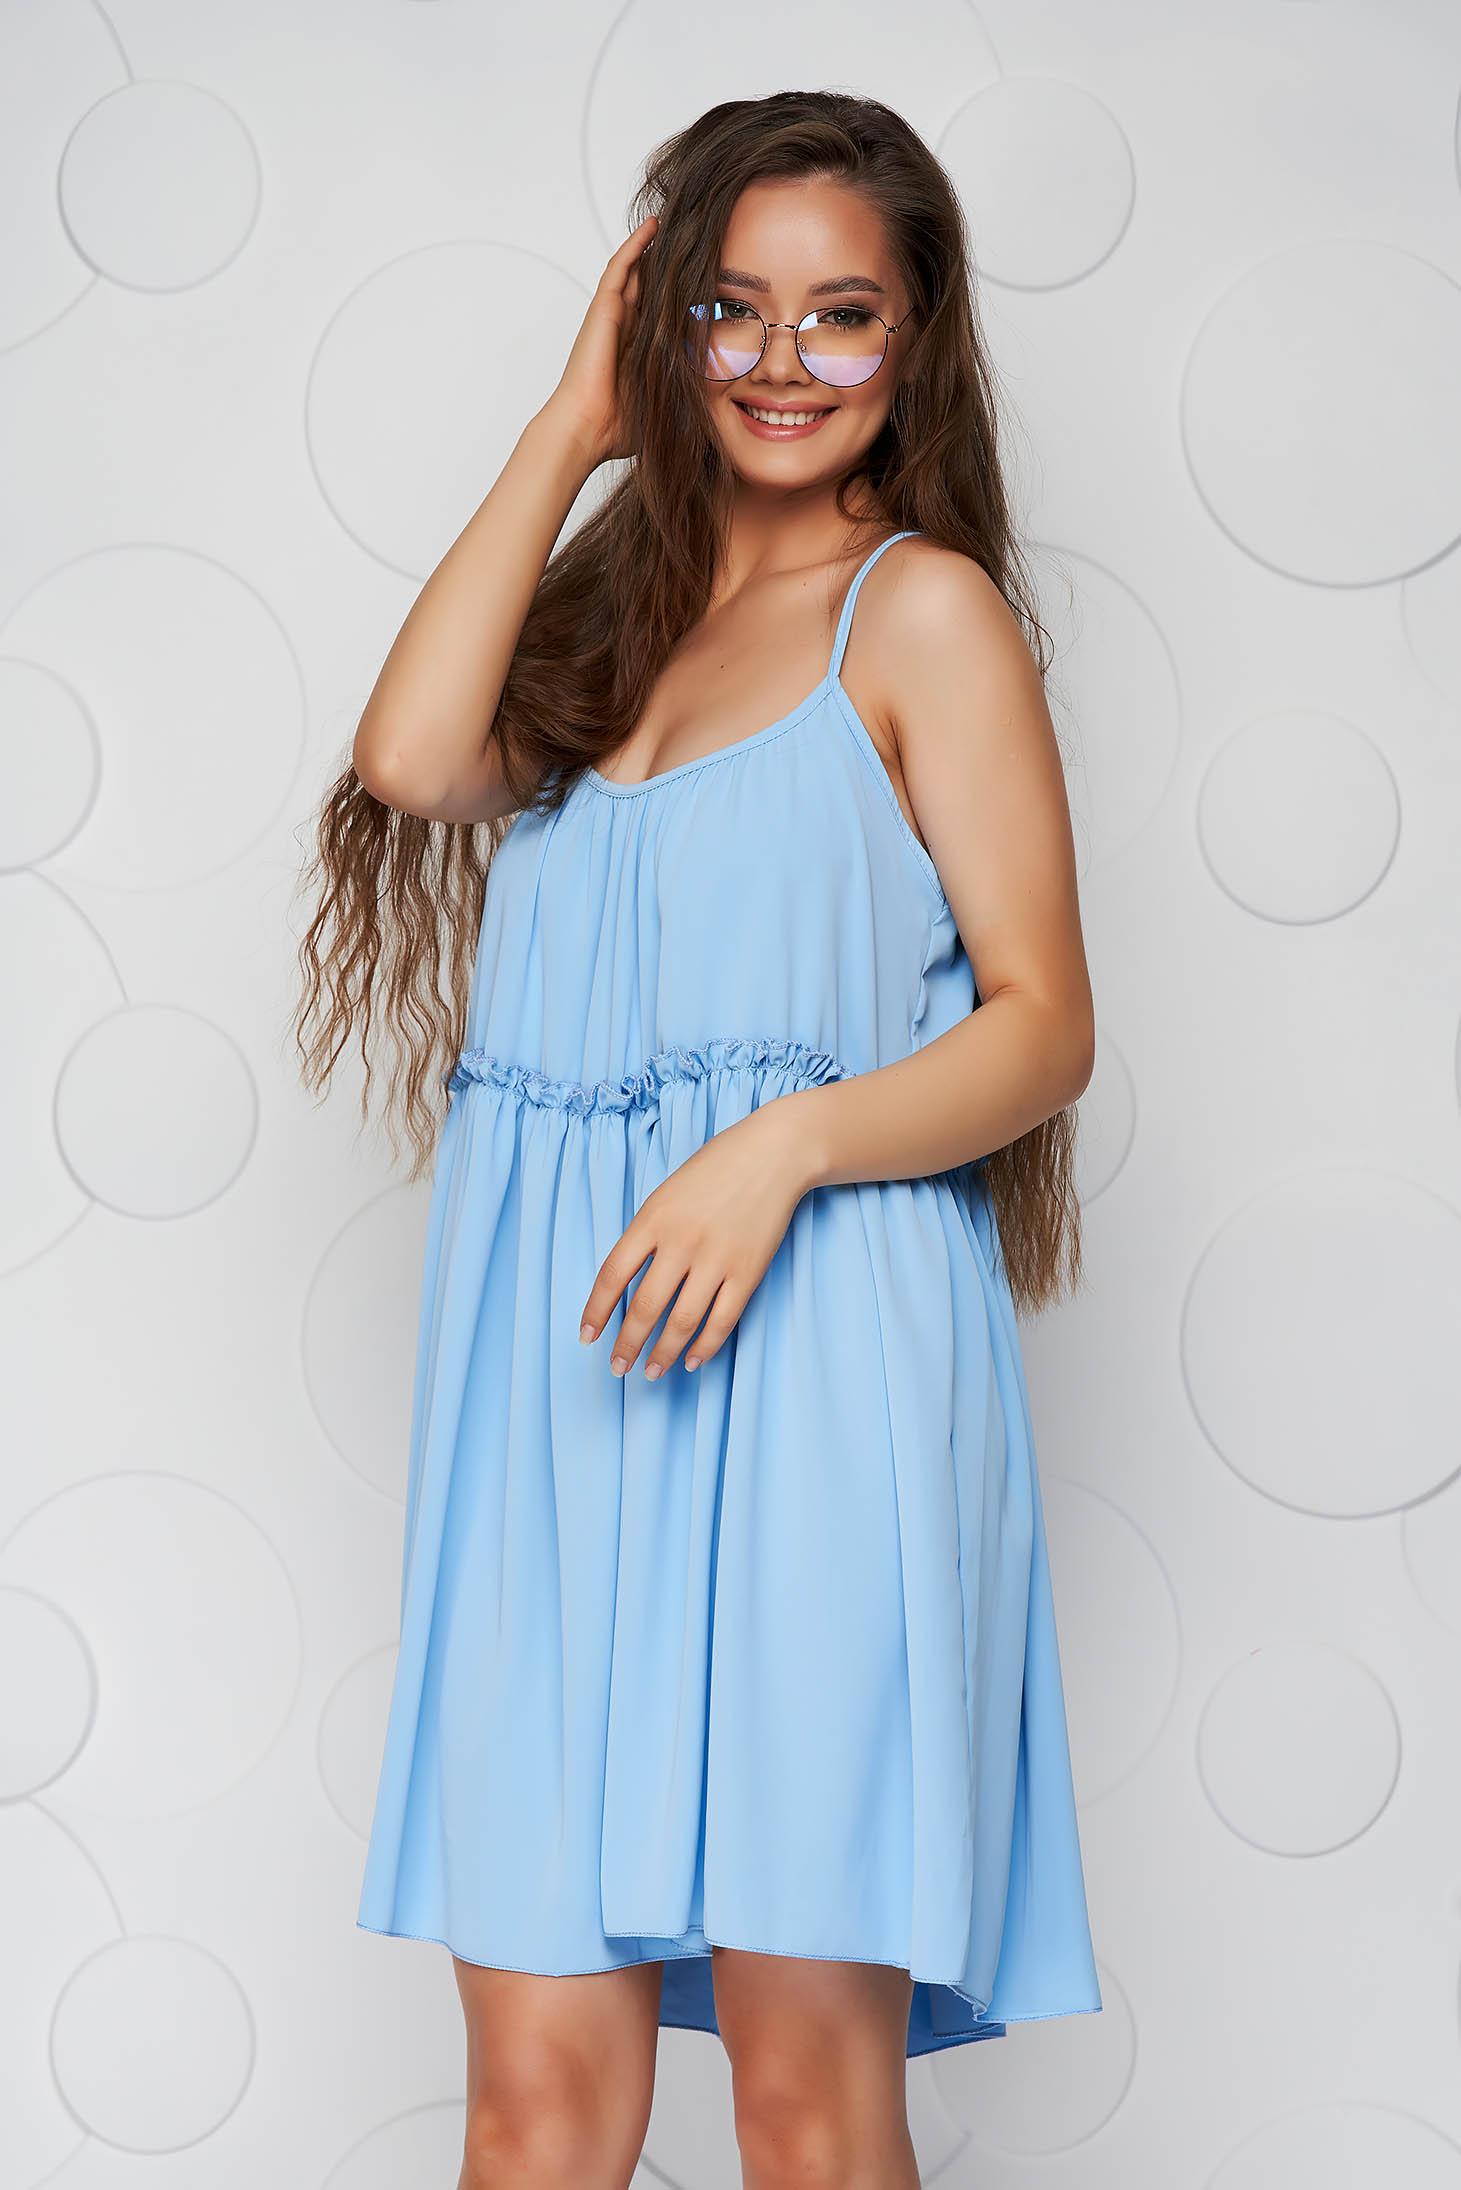 Rochie albastru-deschis din material vaporos si subtire cu croi larg cu bretele si decolteu rotunjit